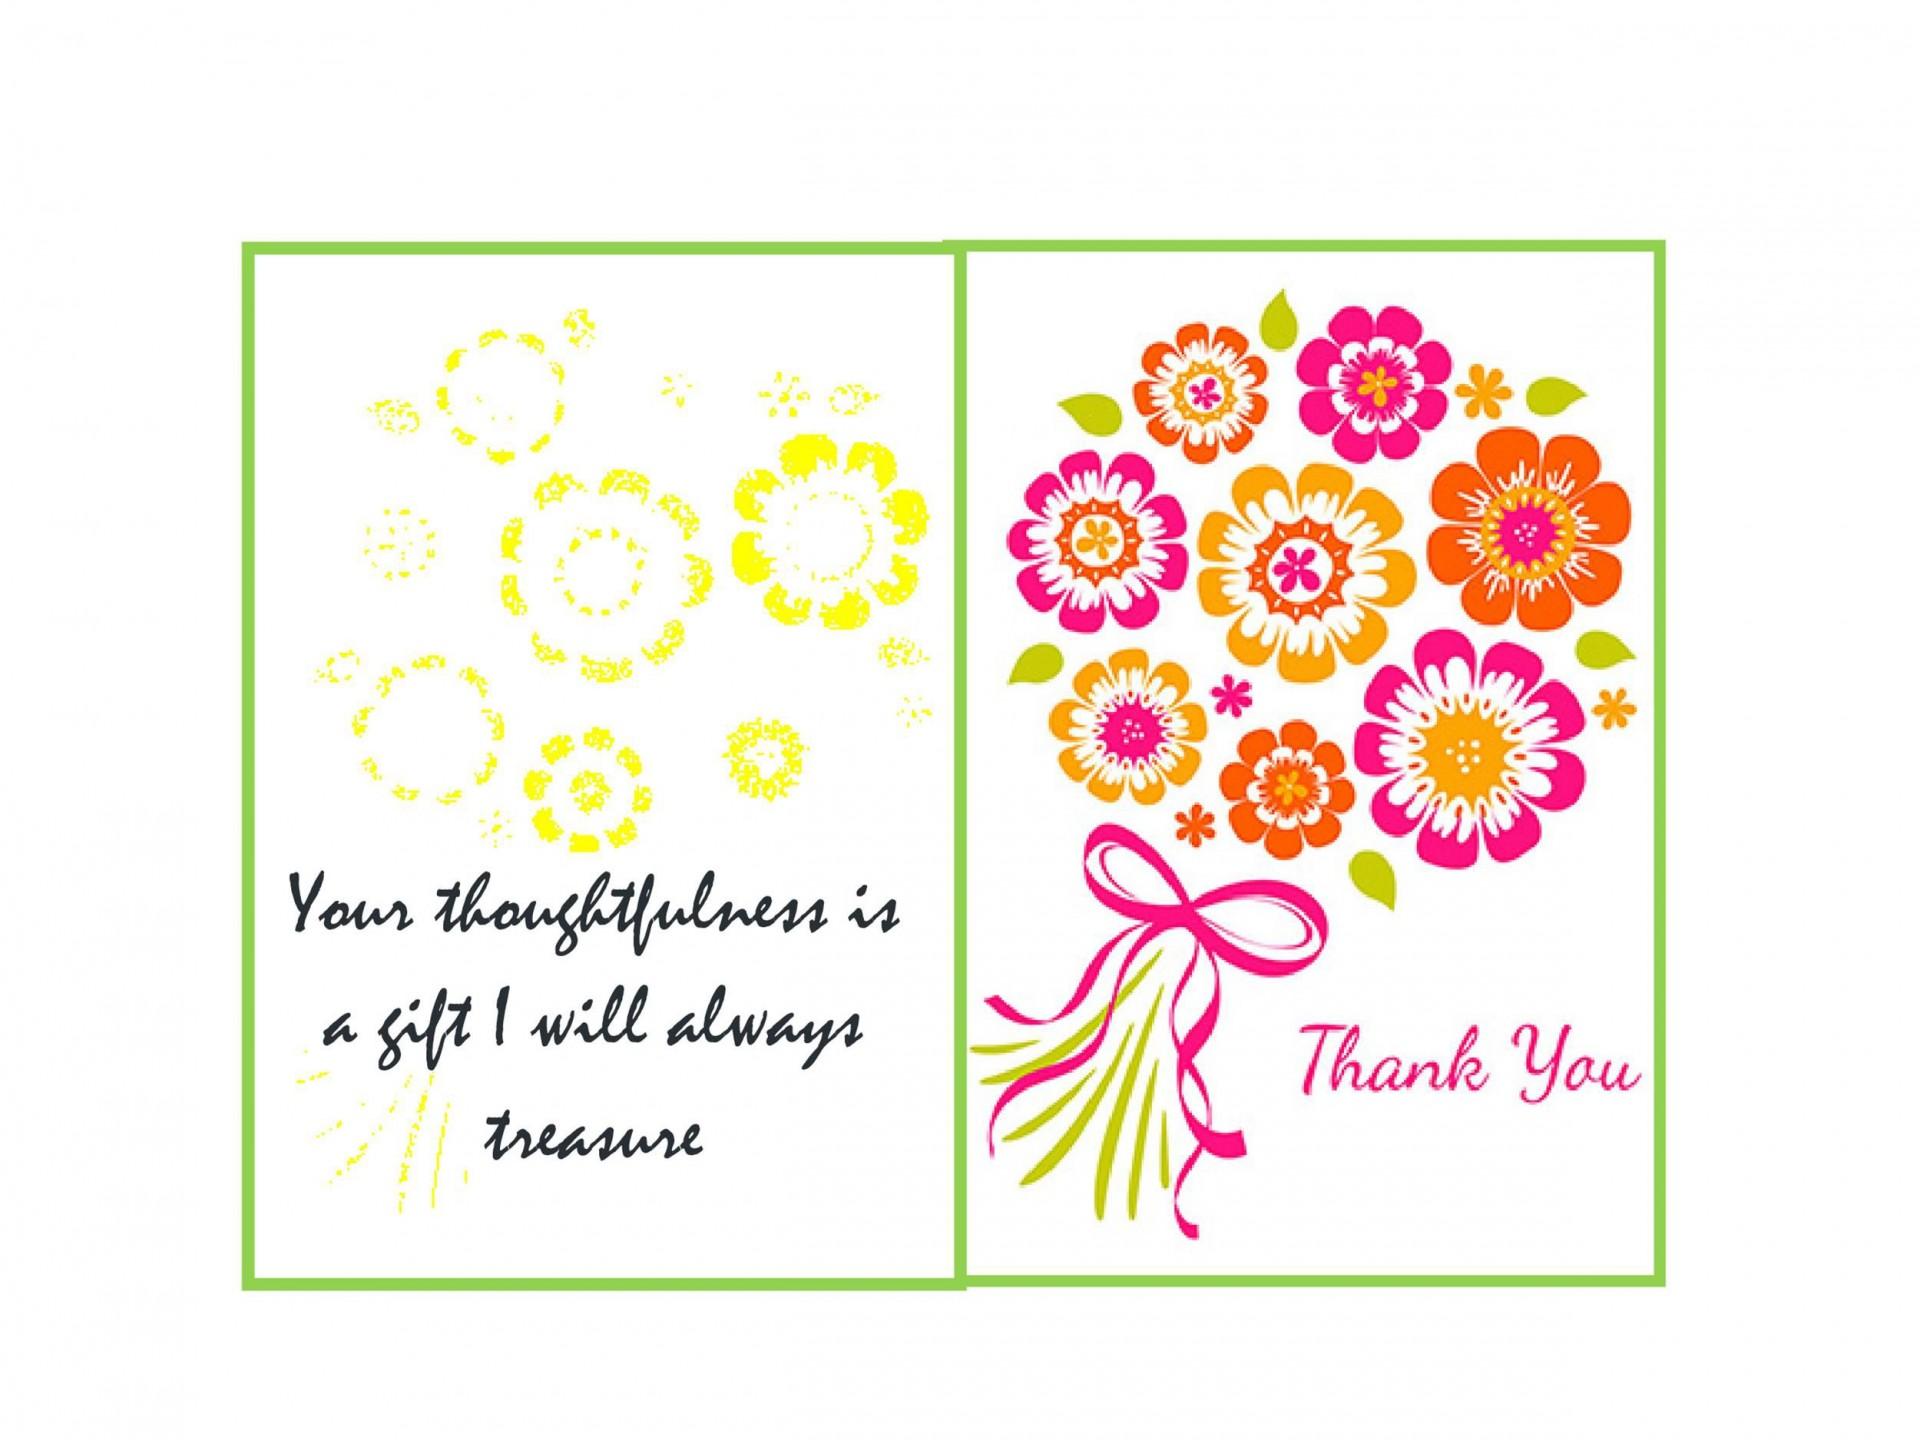 011 Striking Free Printable Photo Card Template Inspiration  Templates Birthday Thank You1920